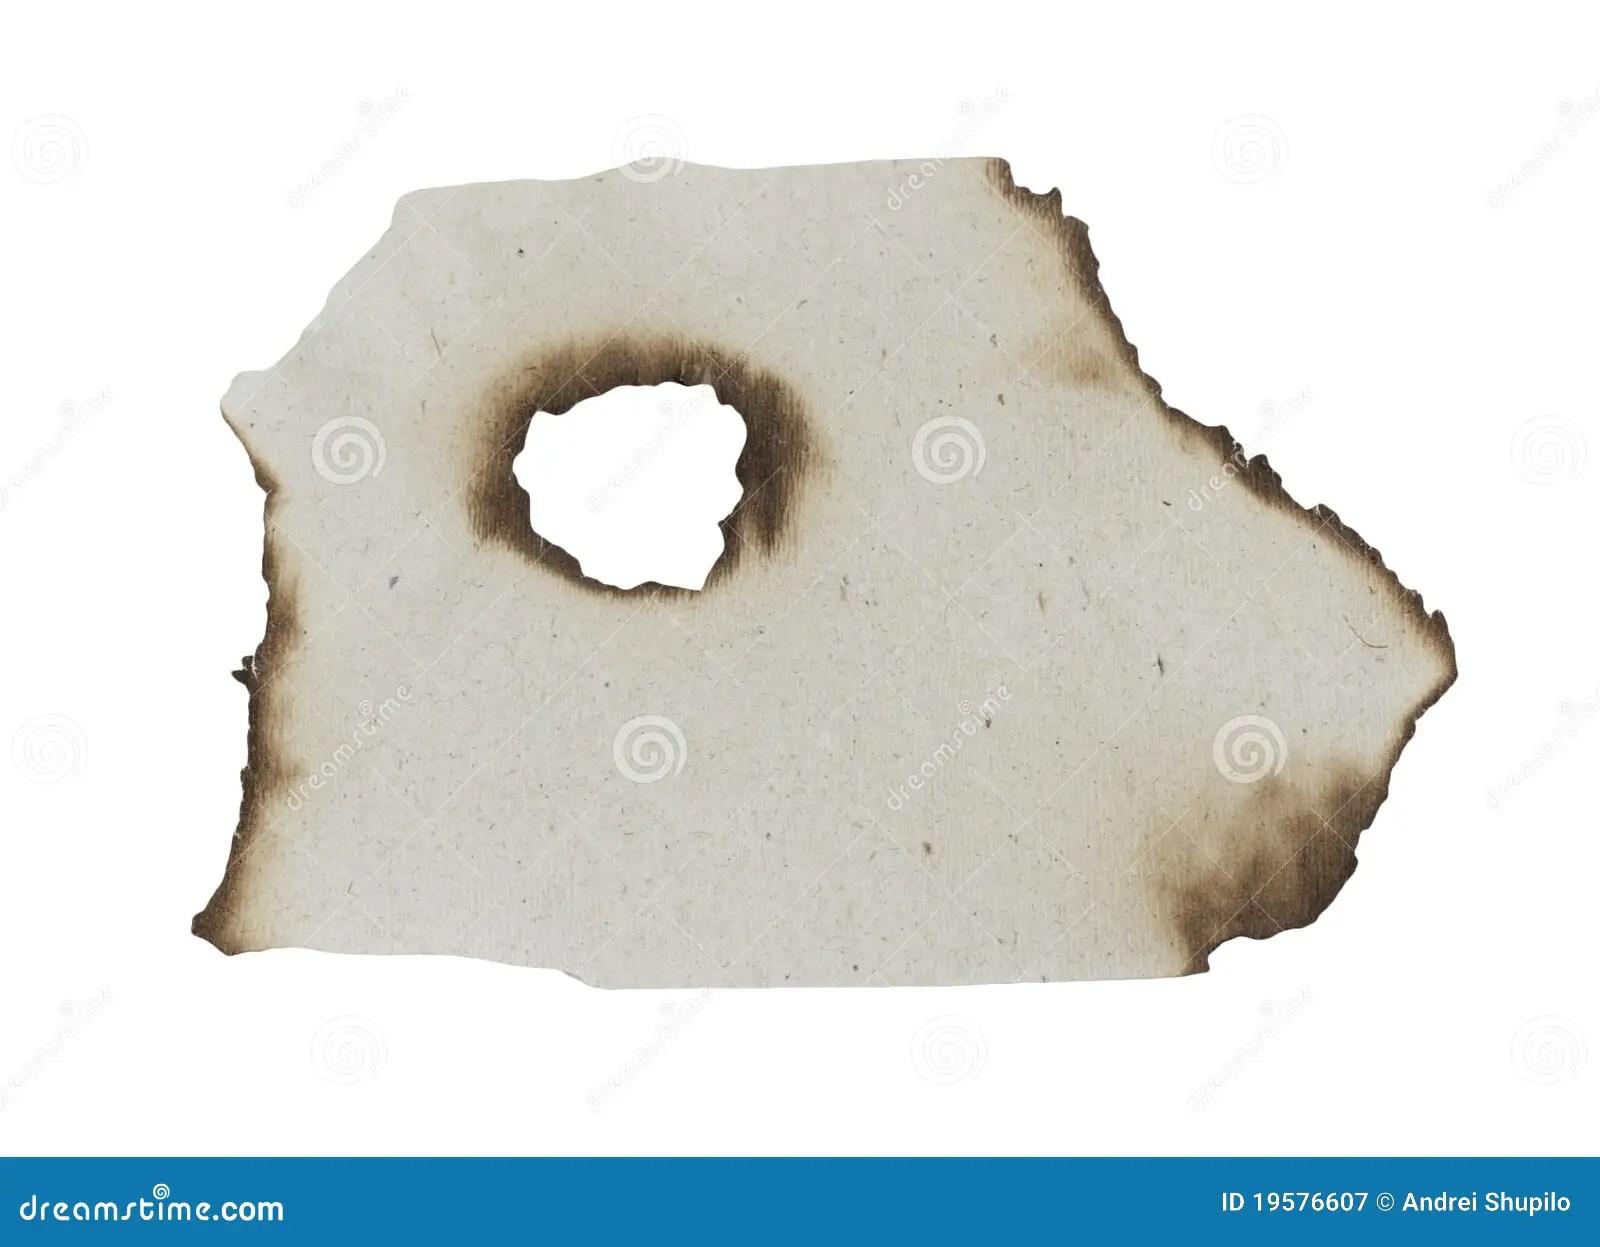 Burnt edges paper stock image. Image of stationary. vintage - 19576607